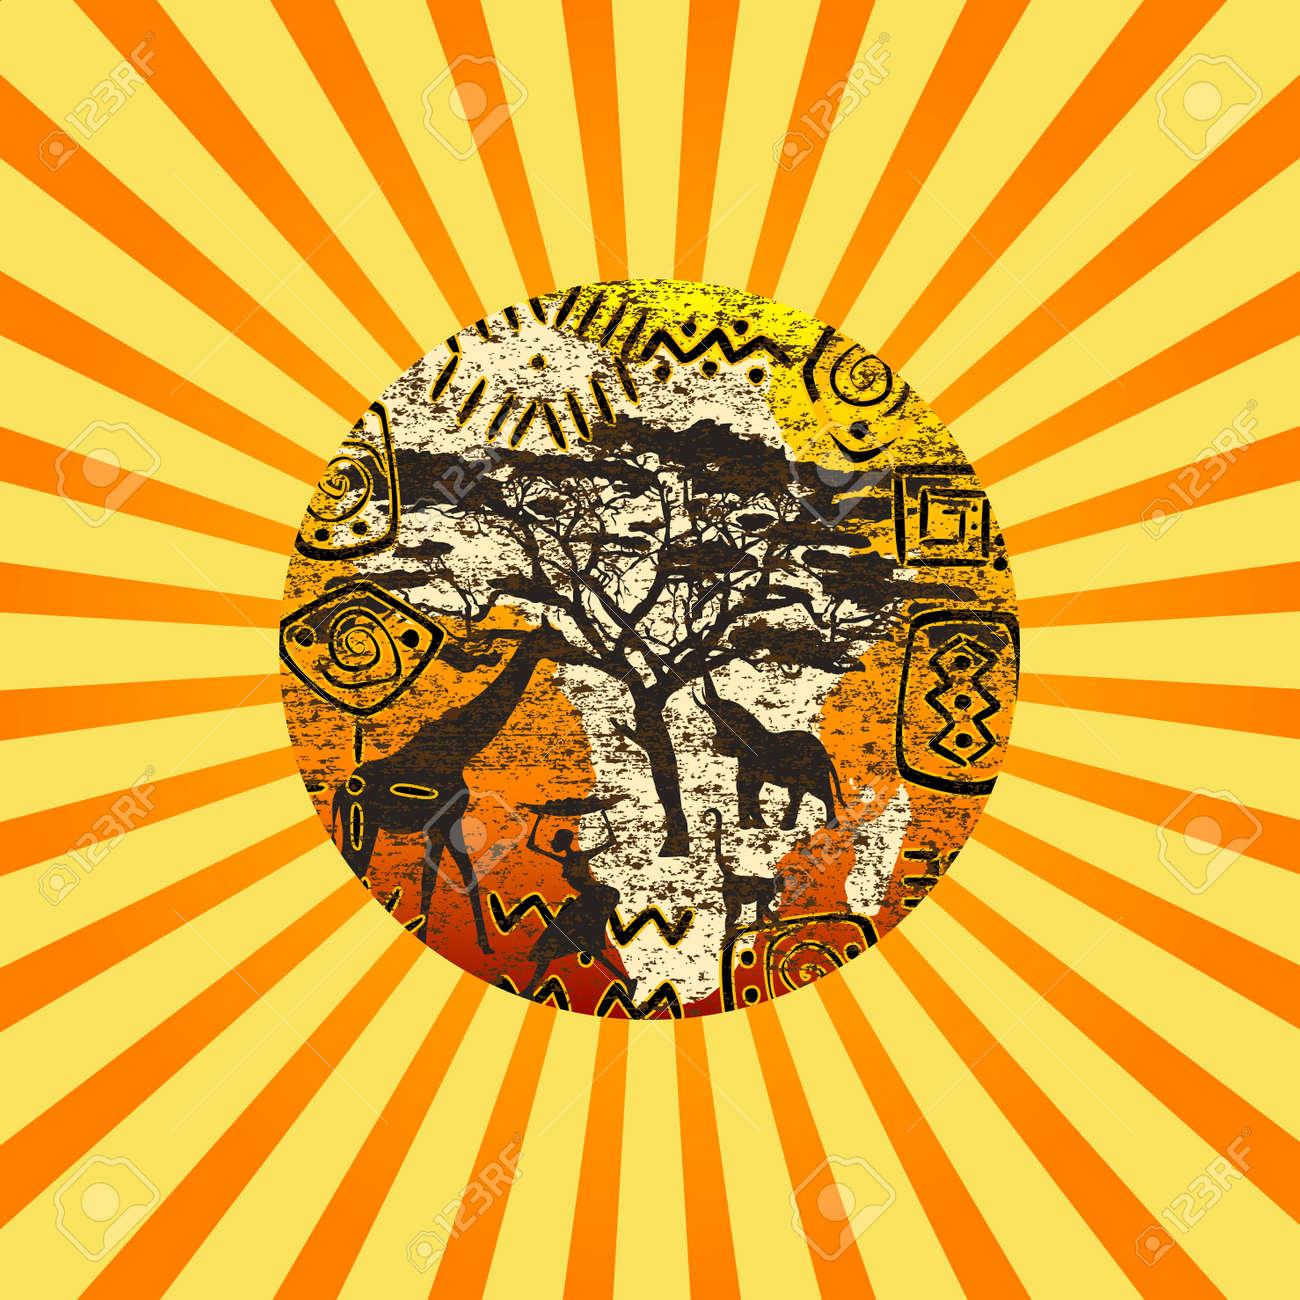 Sunburst with African symbols background - 21033783